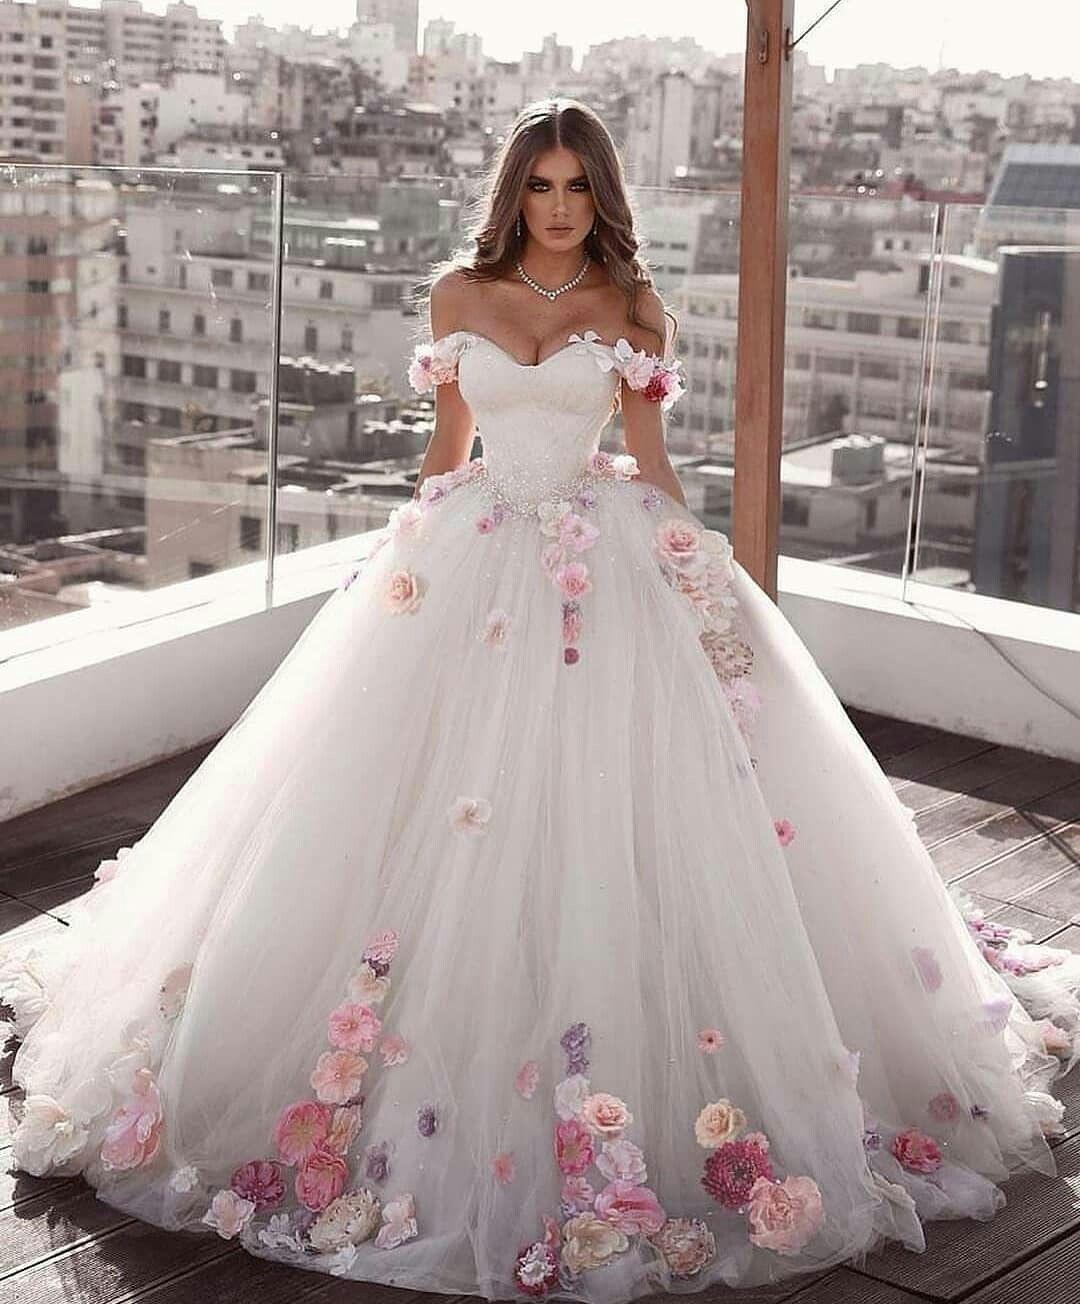 Vestido De Princesa Vestidos De Novia Princesa Vestidos De Novia Tul Vestidos De Novia